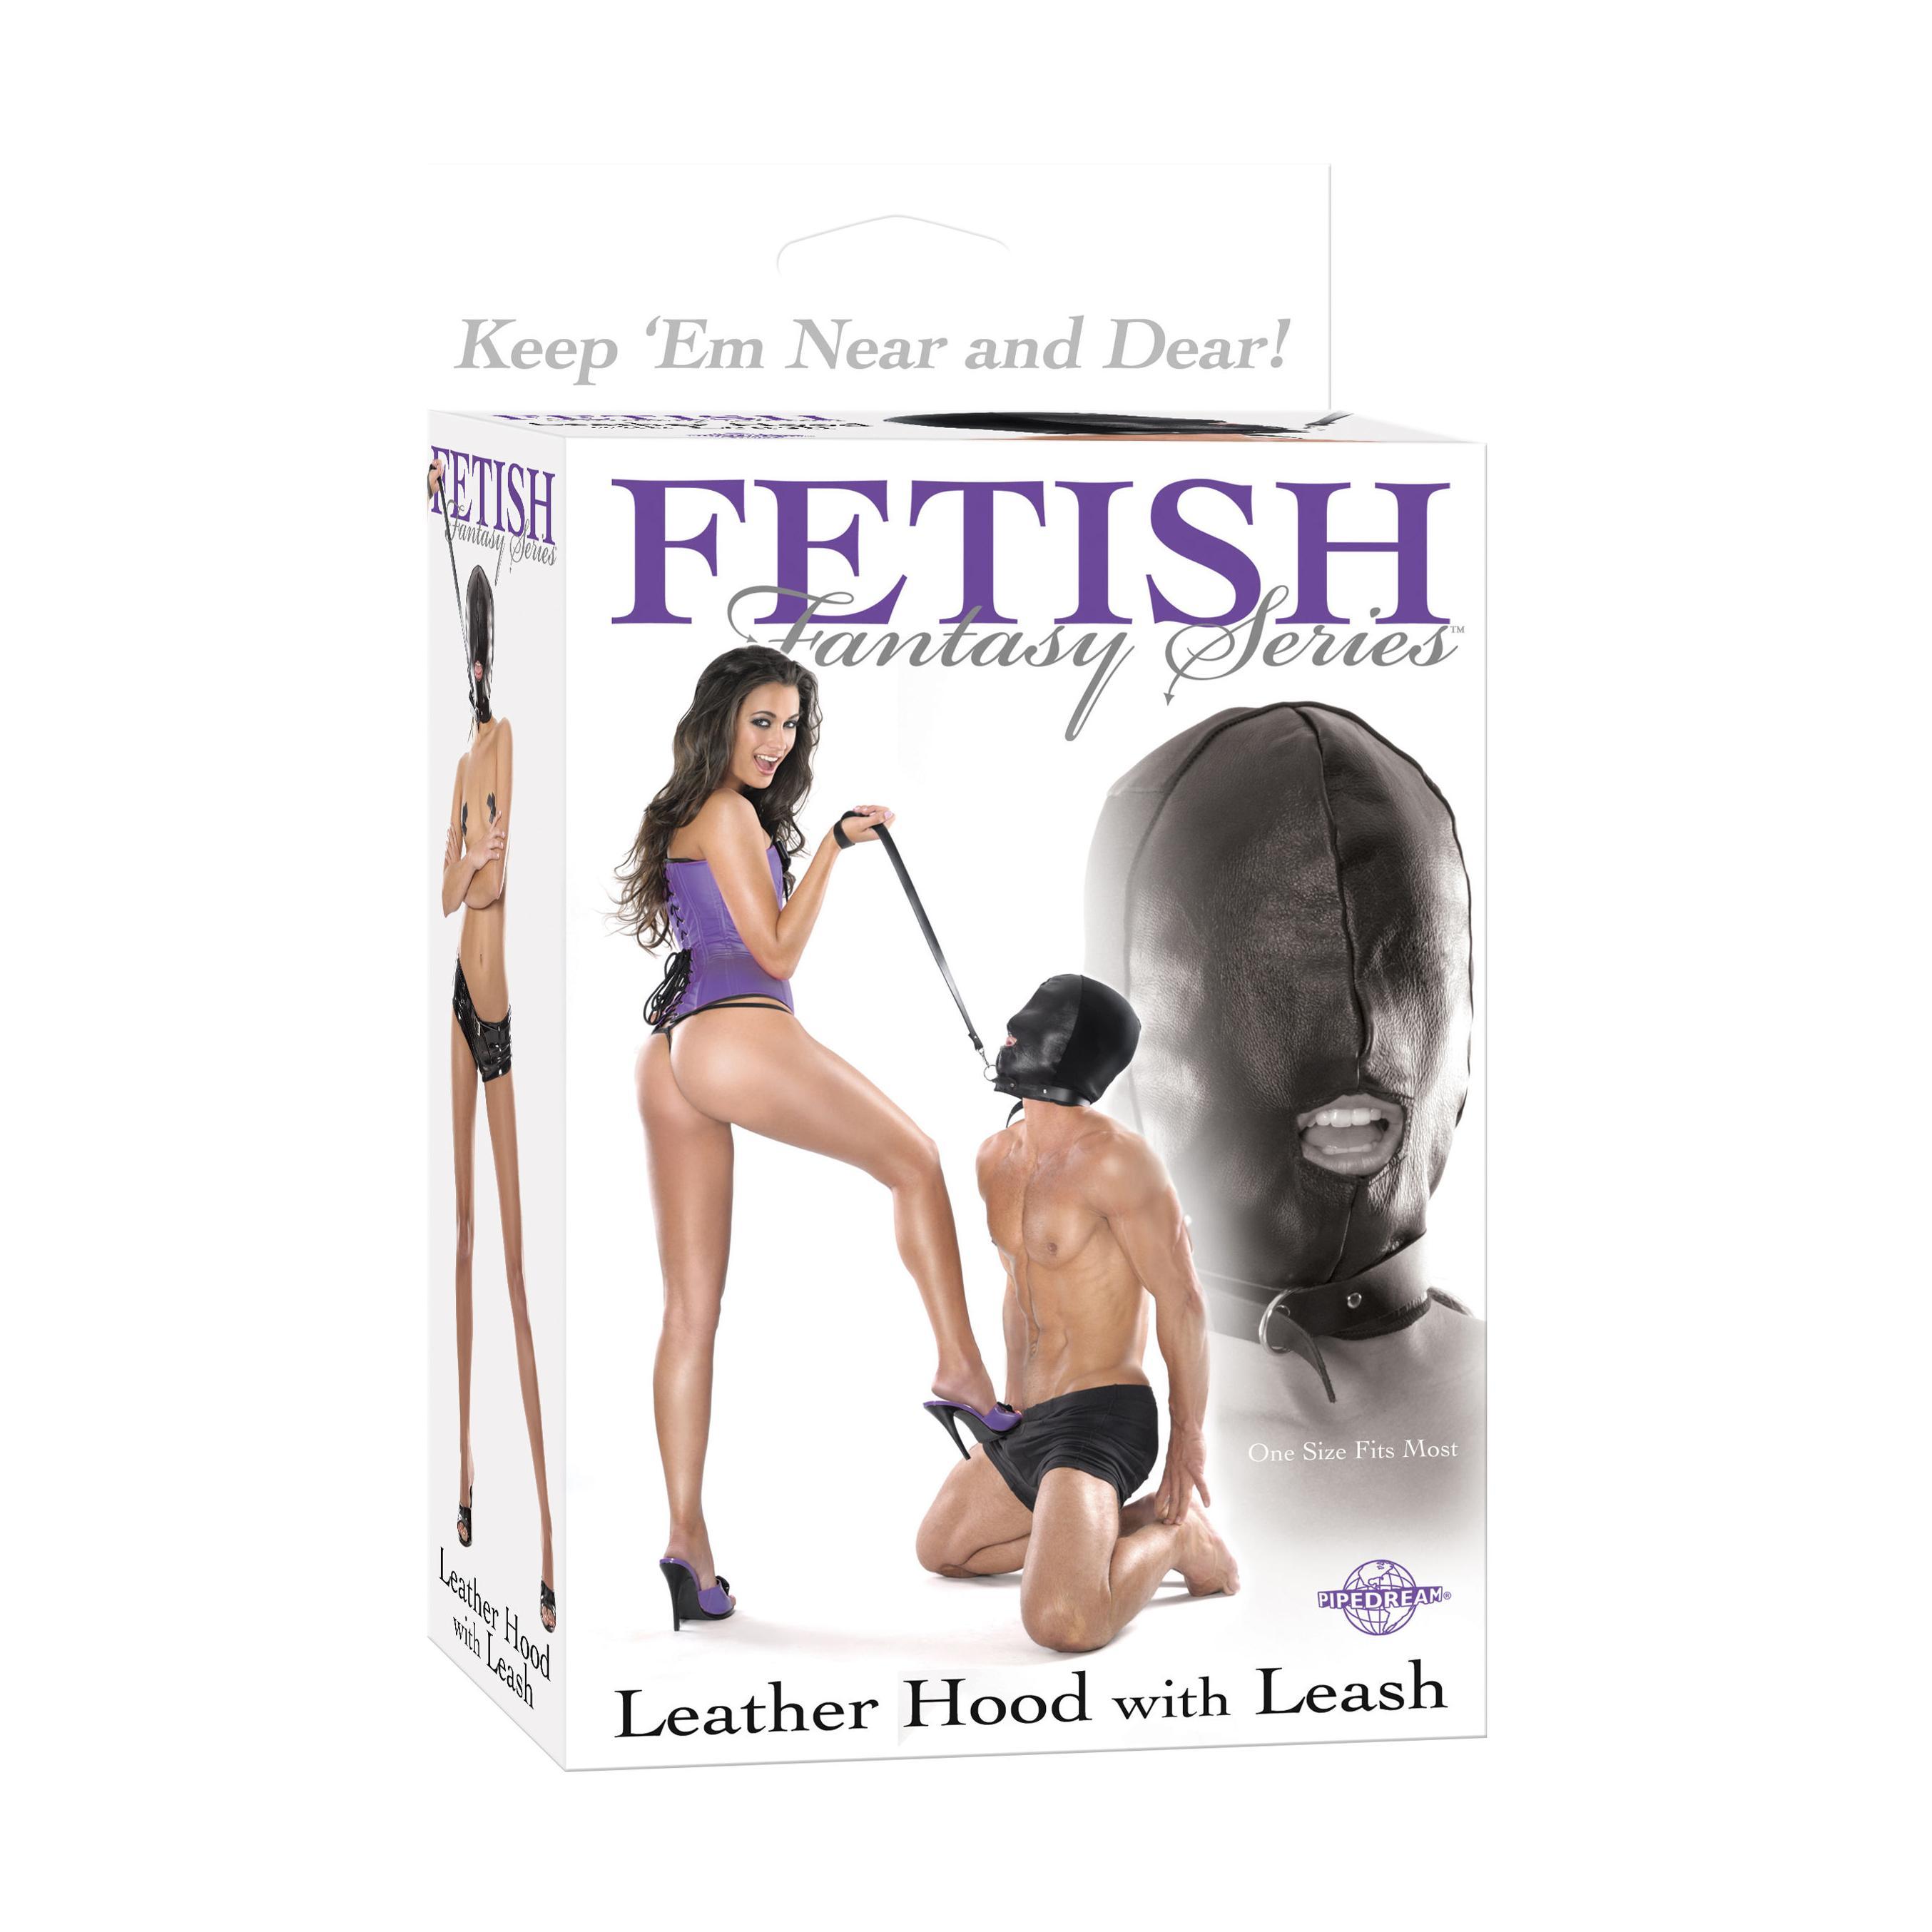 Capucha de piel : Tienda Erótica Mistery de Tienda Erótica Mistery